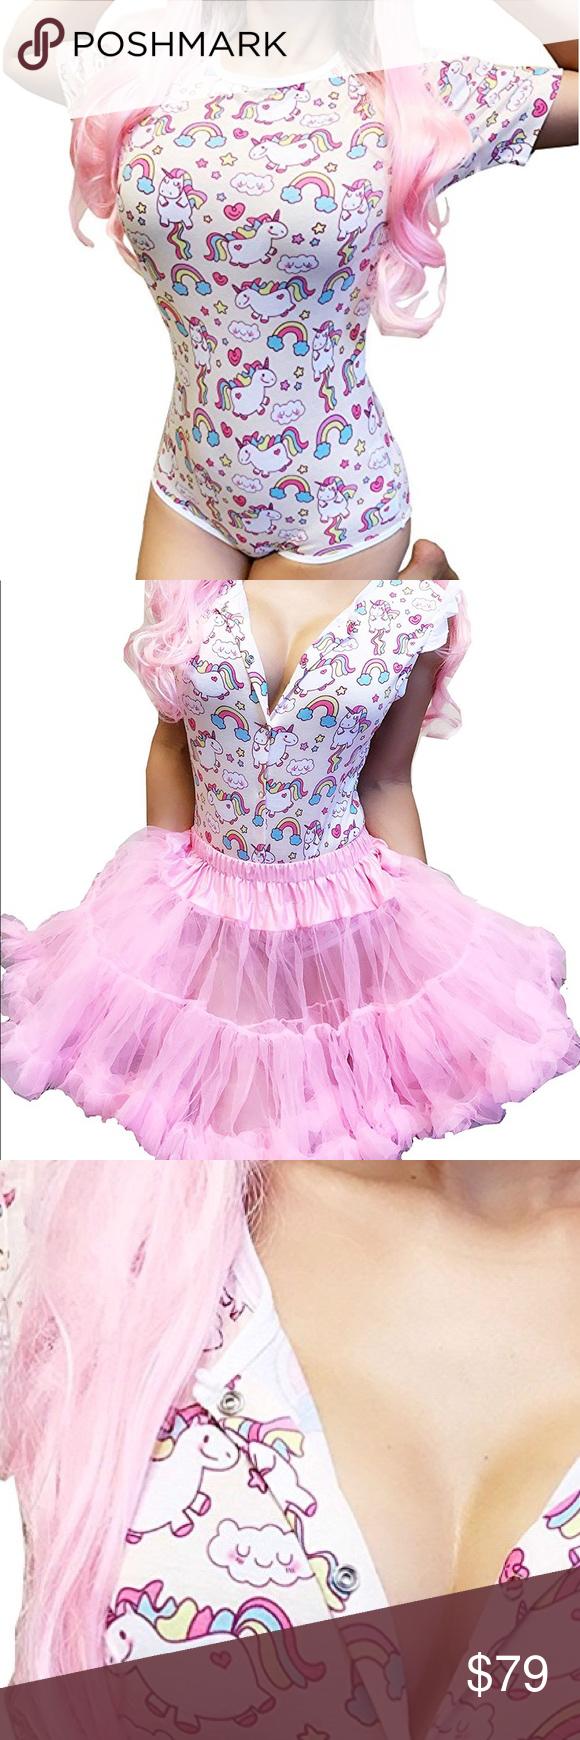 Rainbow unicorn festival rave party costume romper Boutique ...